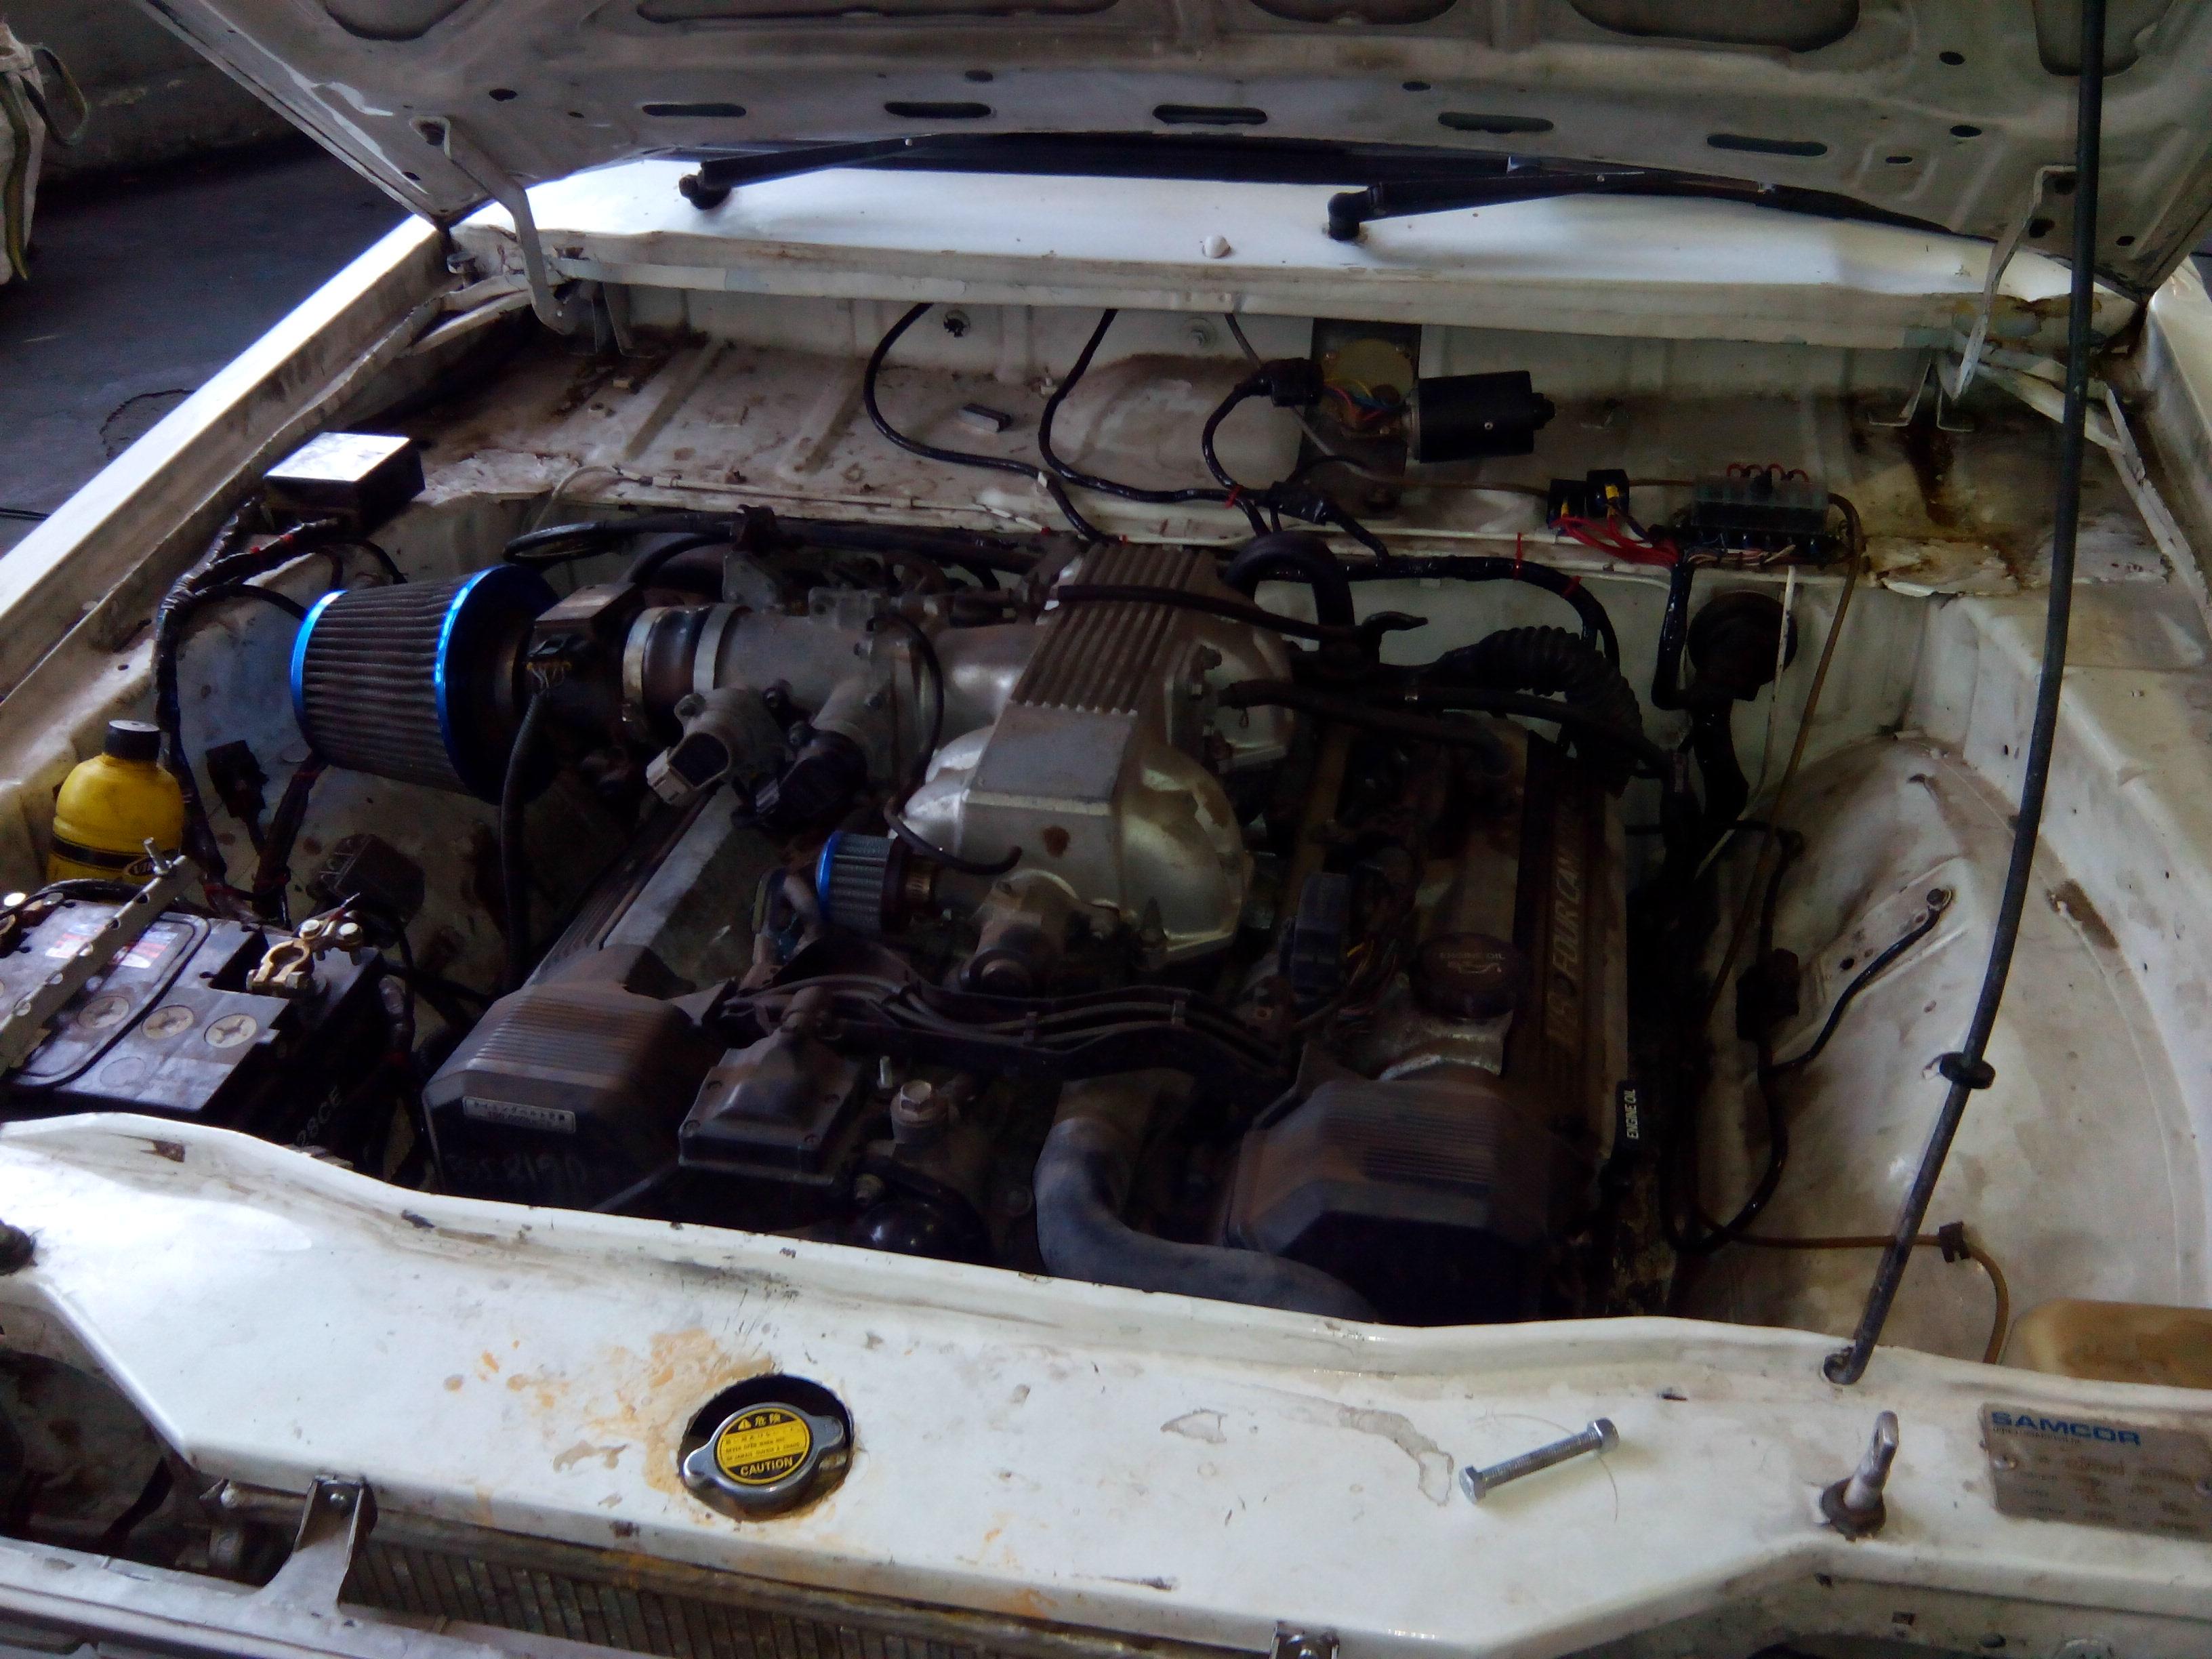 Spitronics Wiring Lexus V8 Mazda Bakkie – Lexus V8 Conversion Wiring